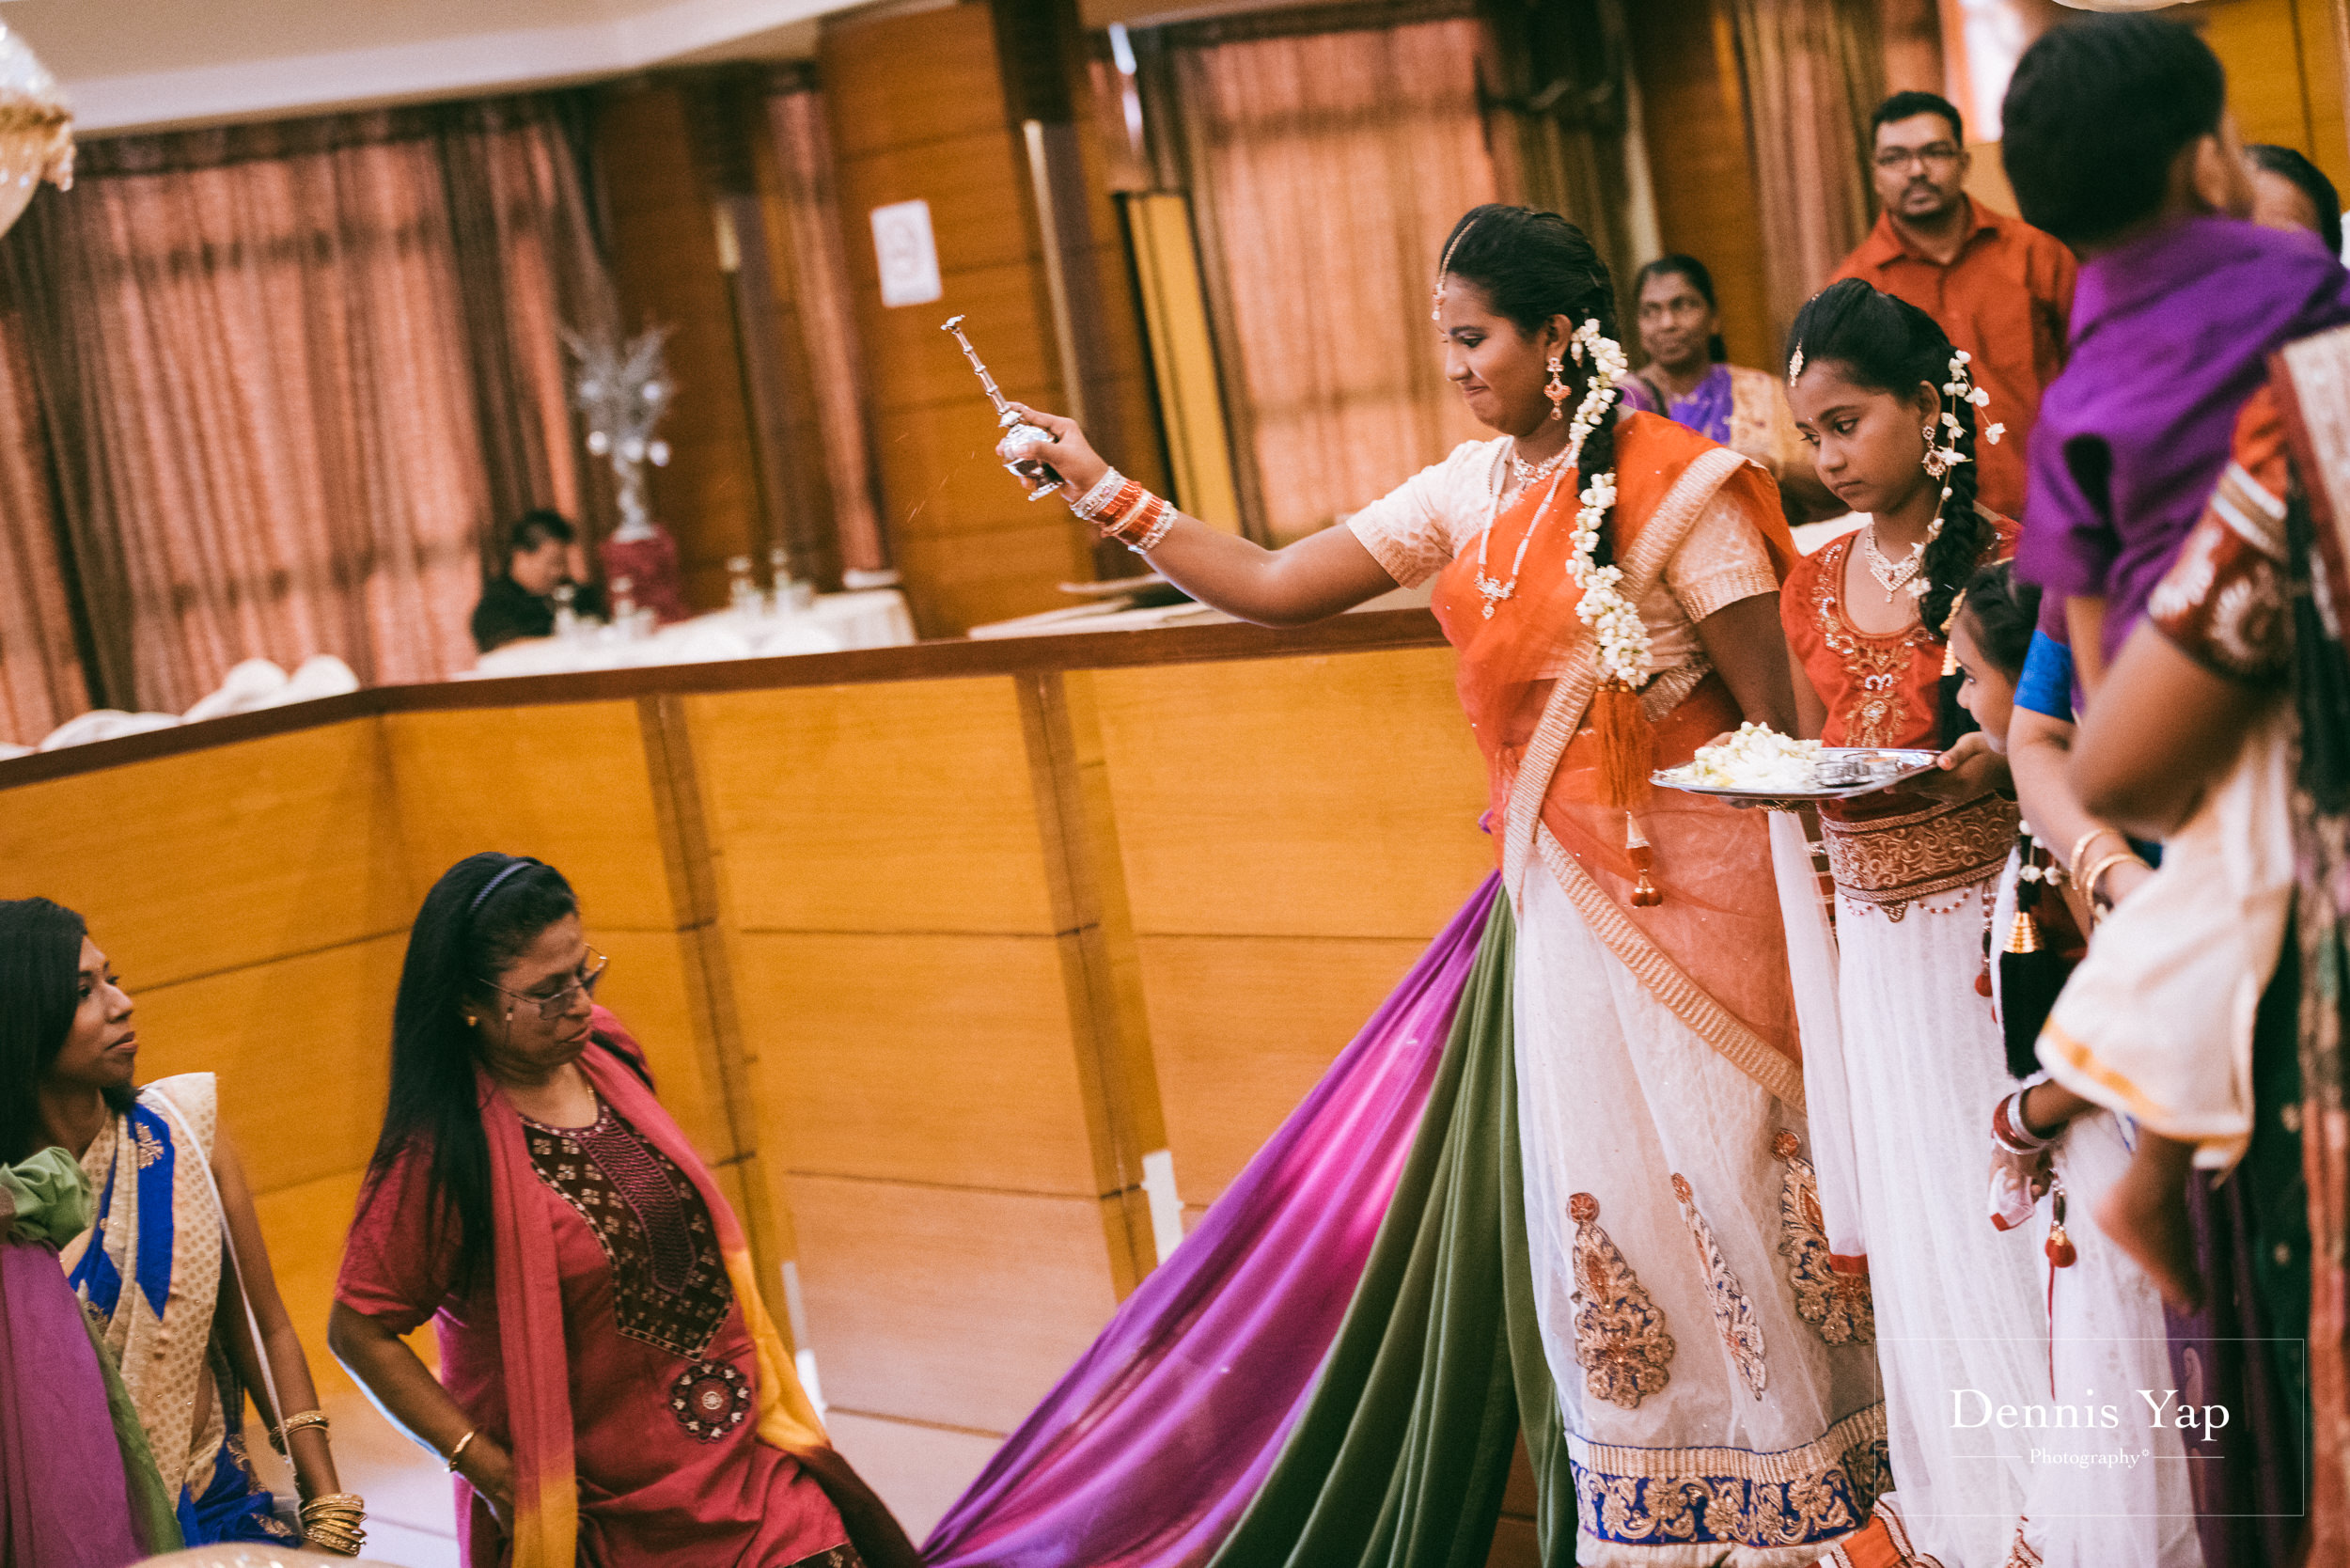 puvaneswaran cangitaa indian wedding ceremony ideal convention dennis yap photography malaysia-6.jpg